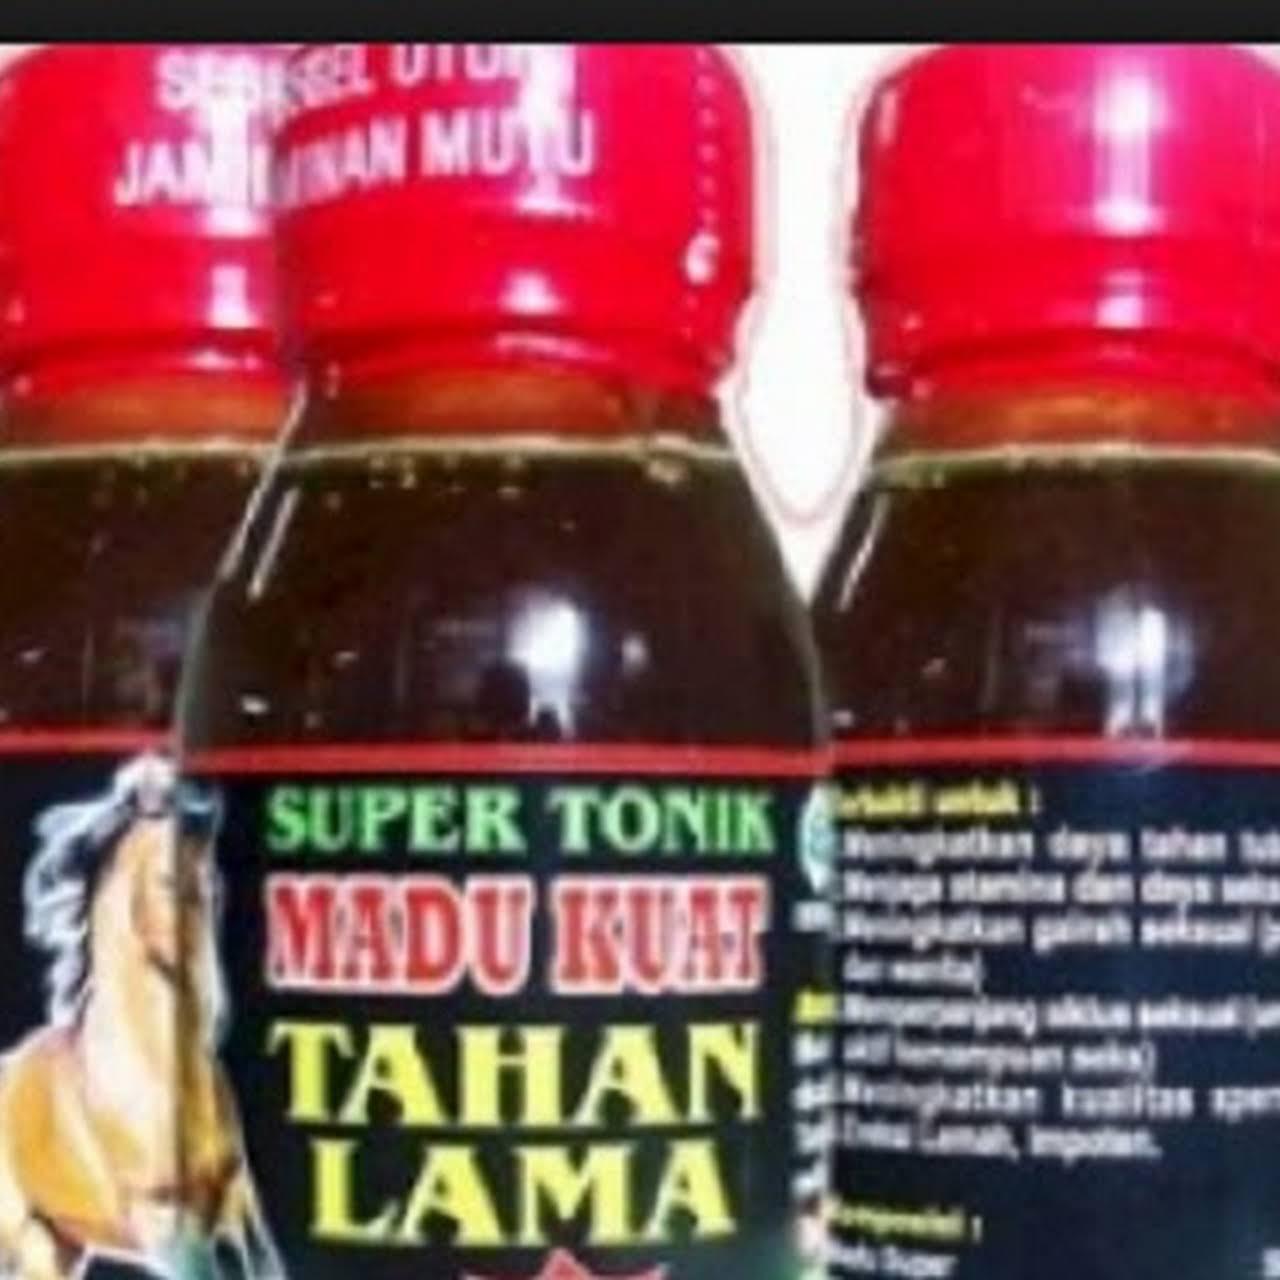 Jual Viagra Surabaya Agen Hammer Of Thor Vimax Asli Original Super Tonik Madu Kuat Tahan Lama 6x